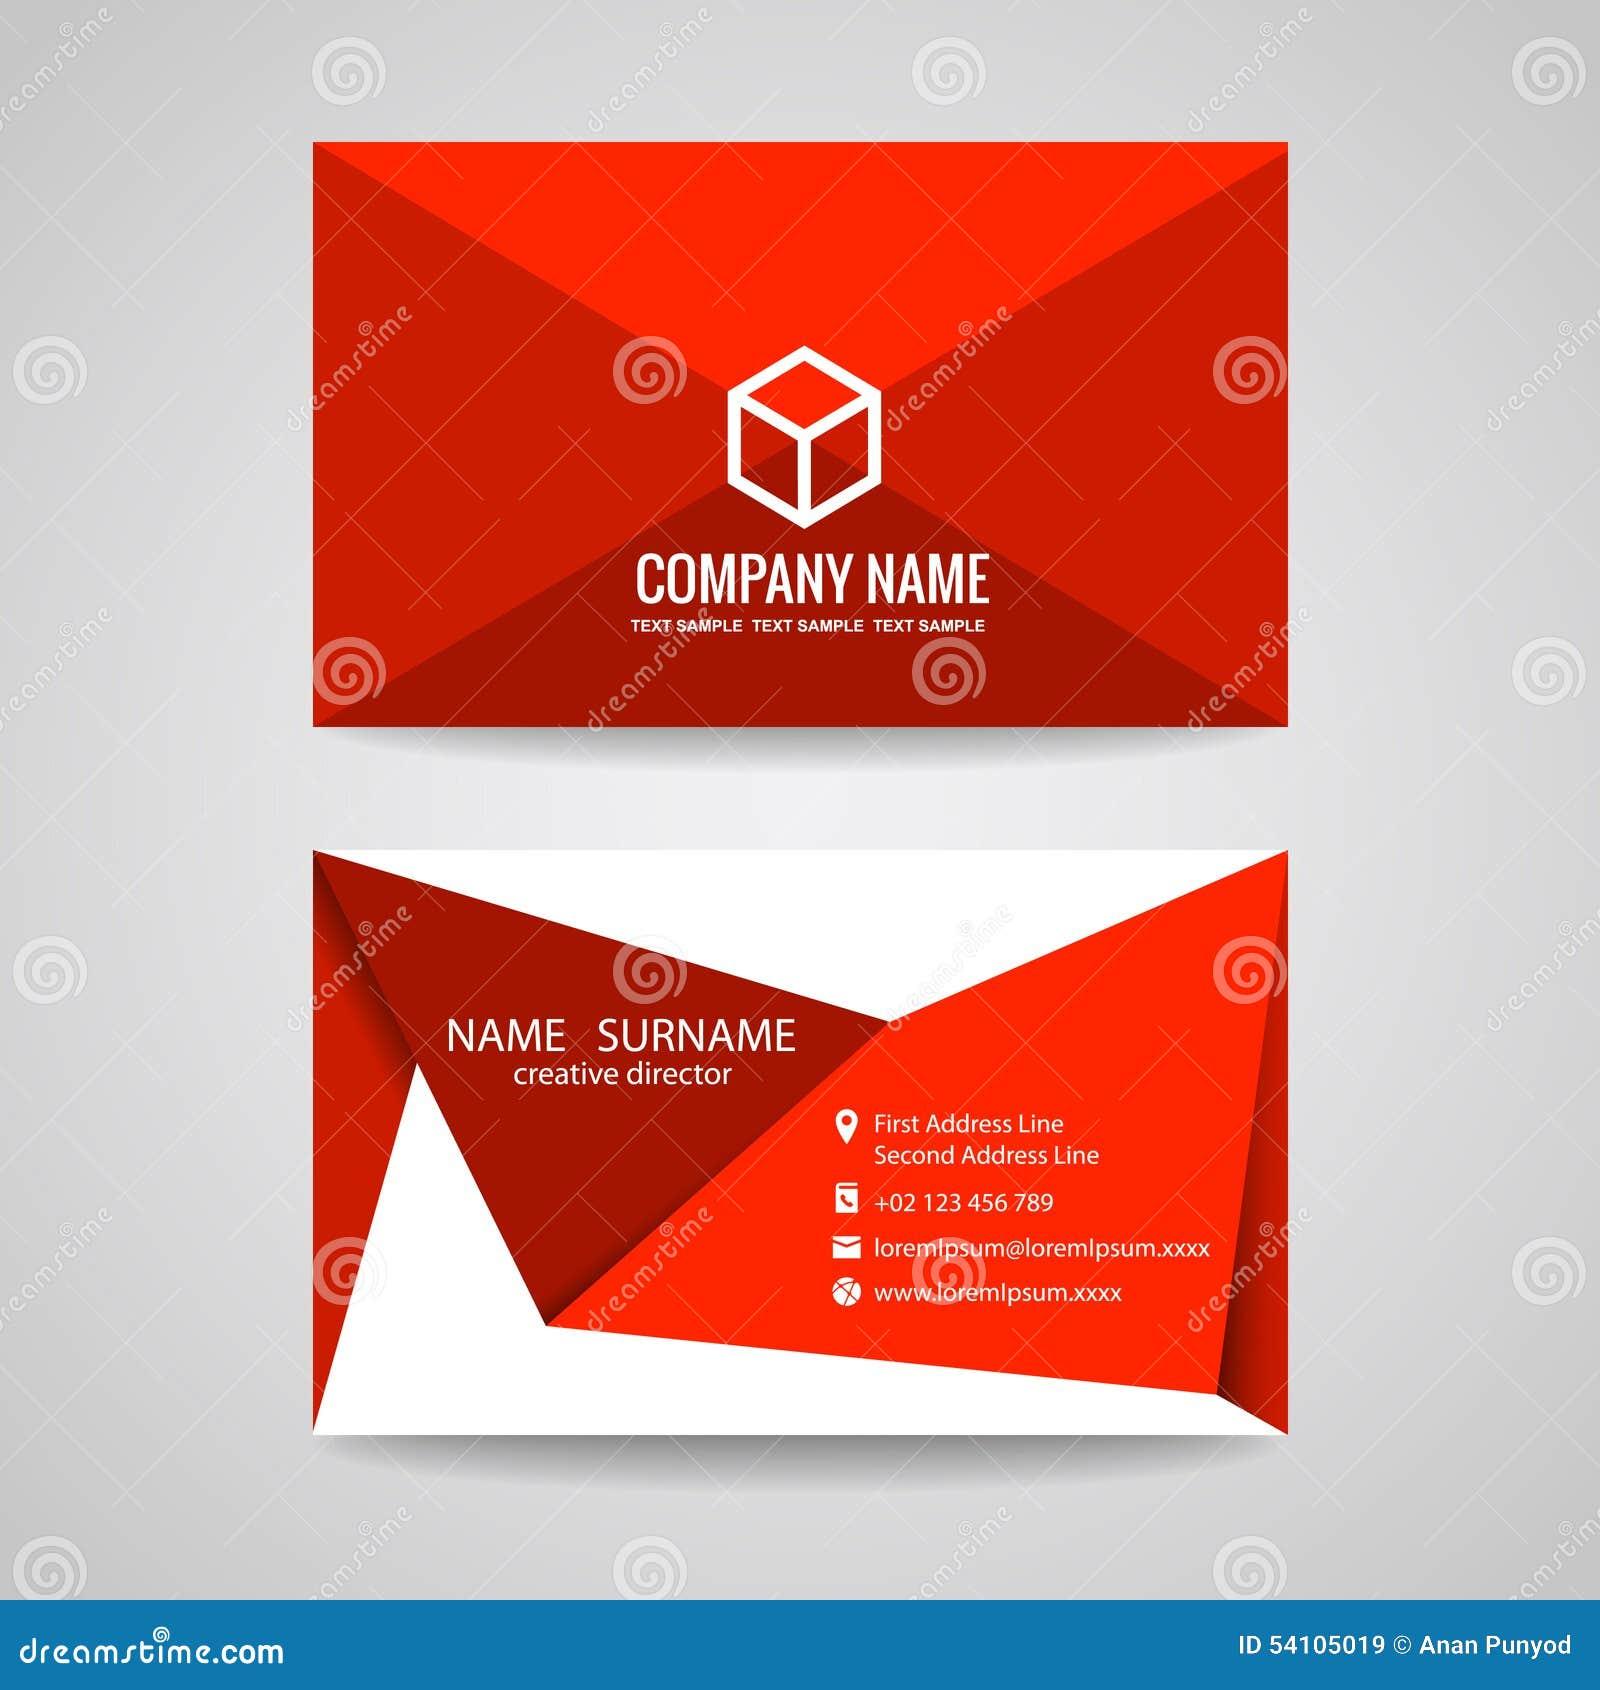 Business cards and logo design - oukas.info